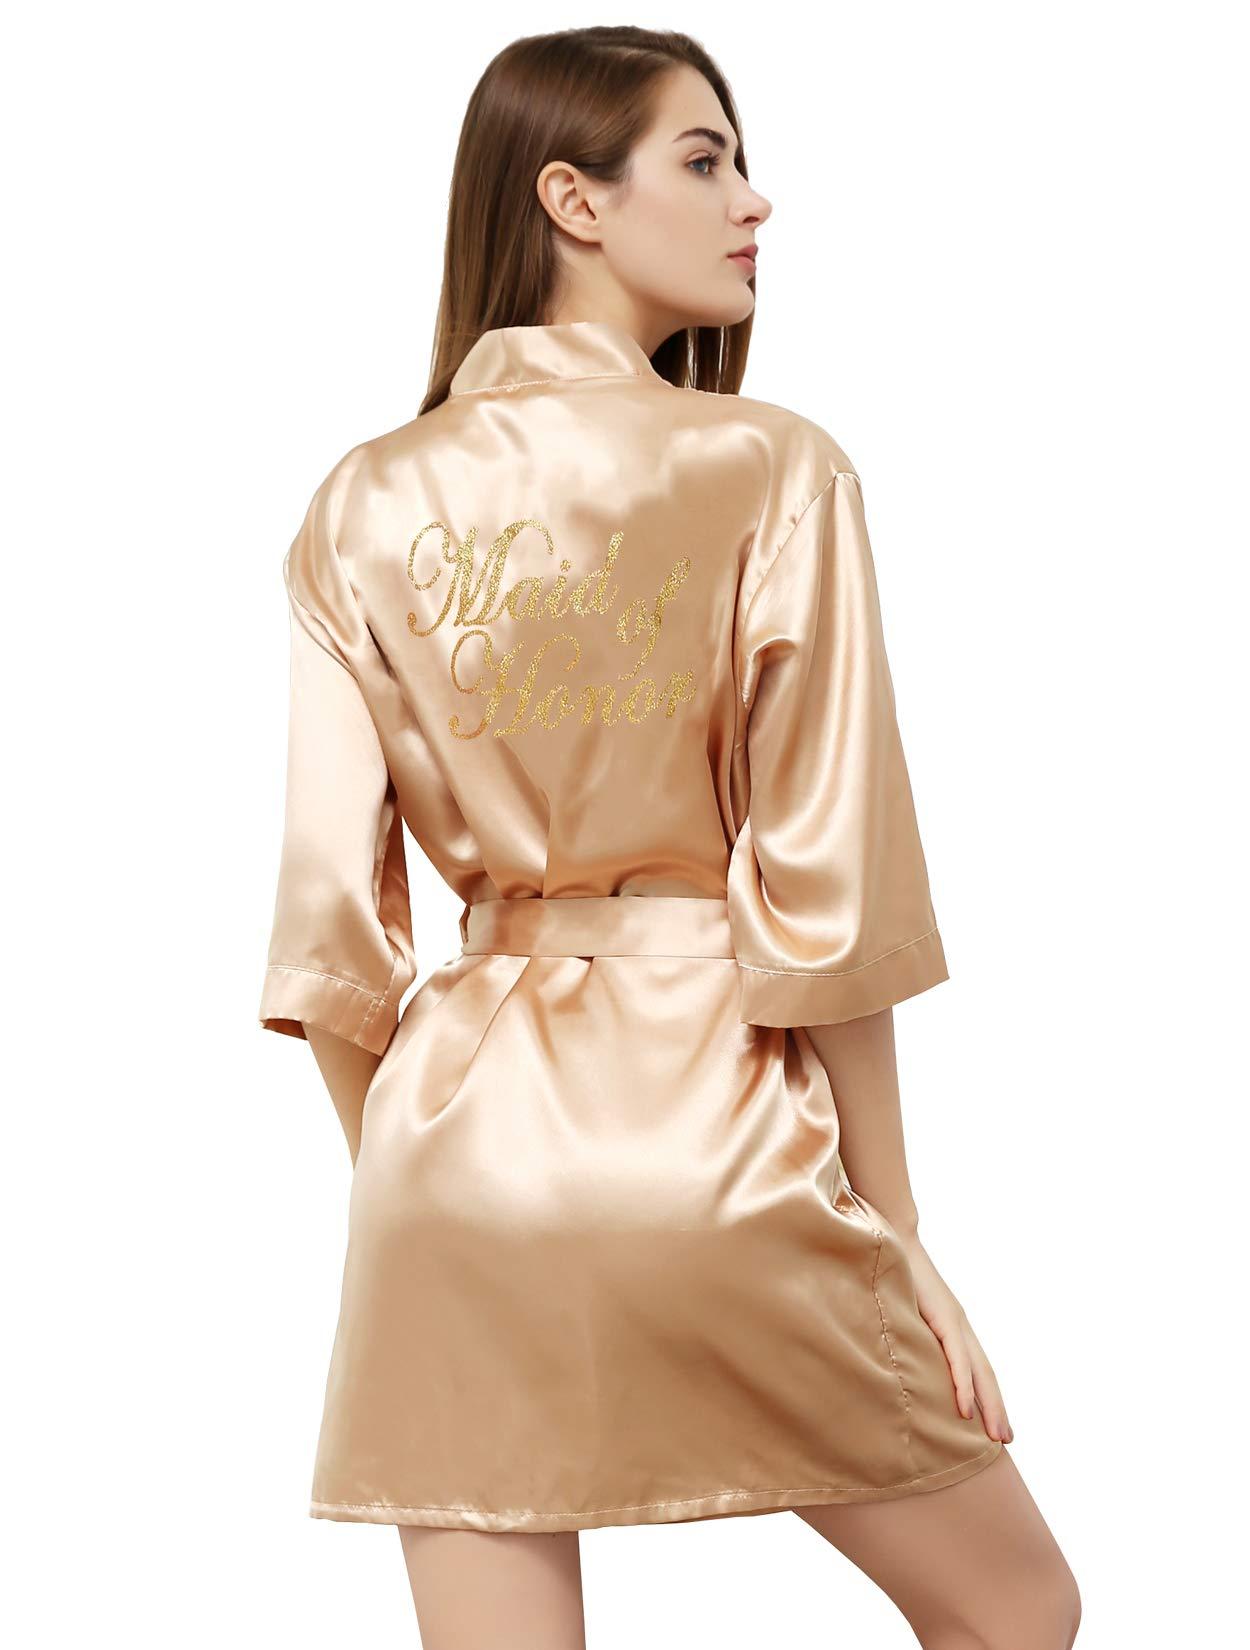 PROGULOVER Women Satin Kimono Robe for Bride Bridesmaid Robes Pajamas Wedding Party with Gold Glitter